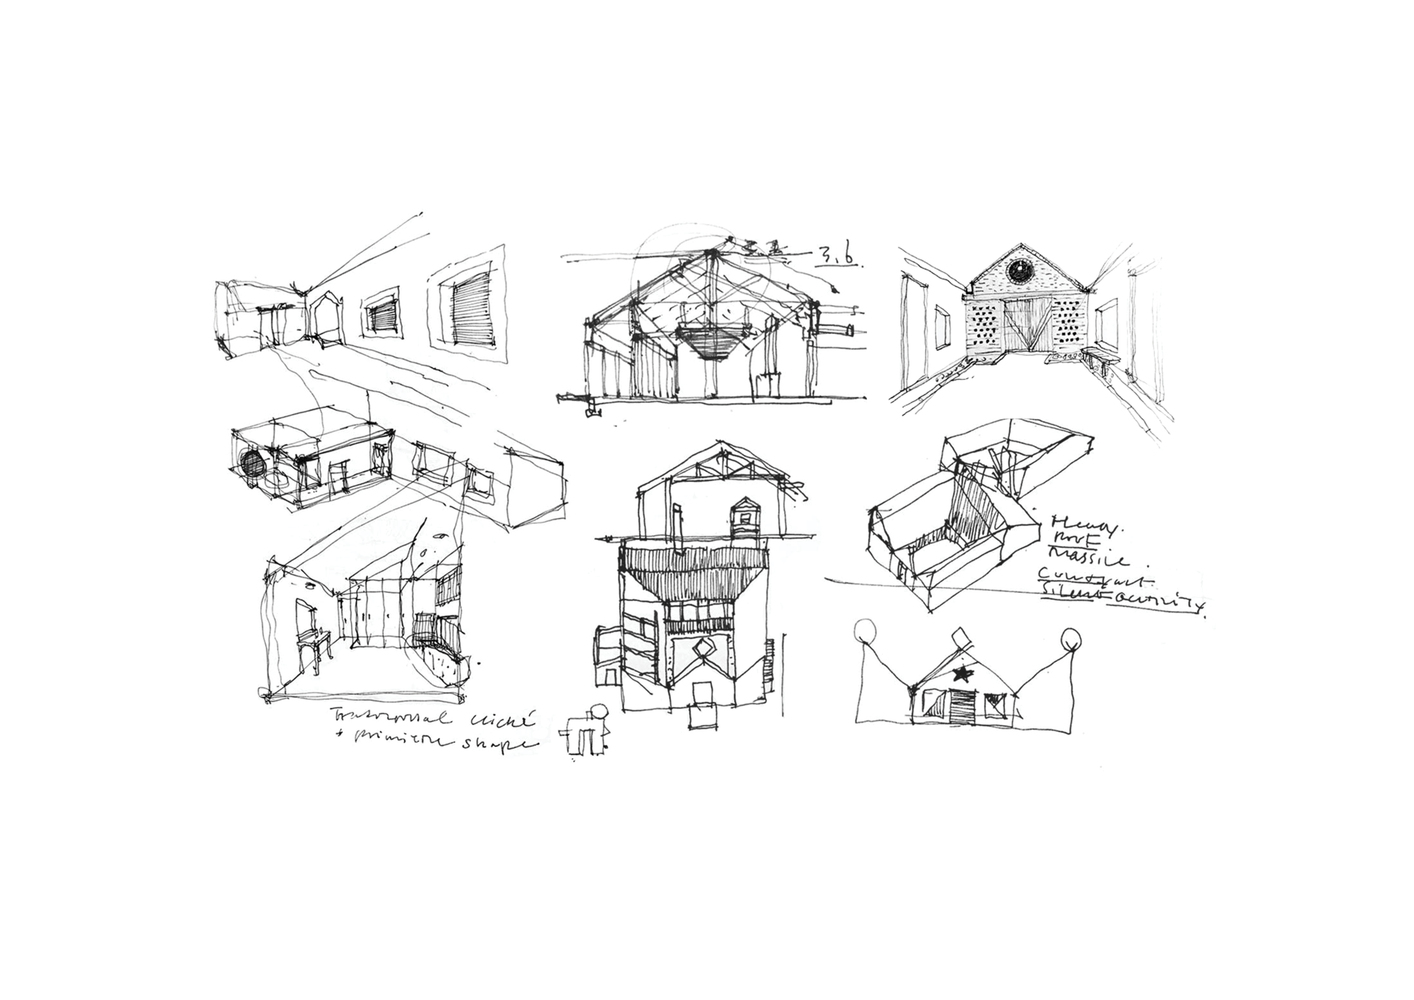 medium resolution of  house digeut jip aoa architects